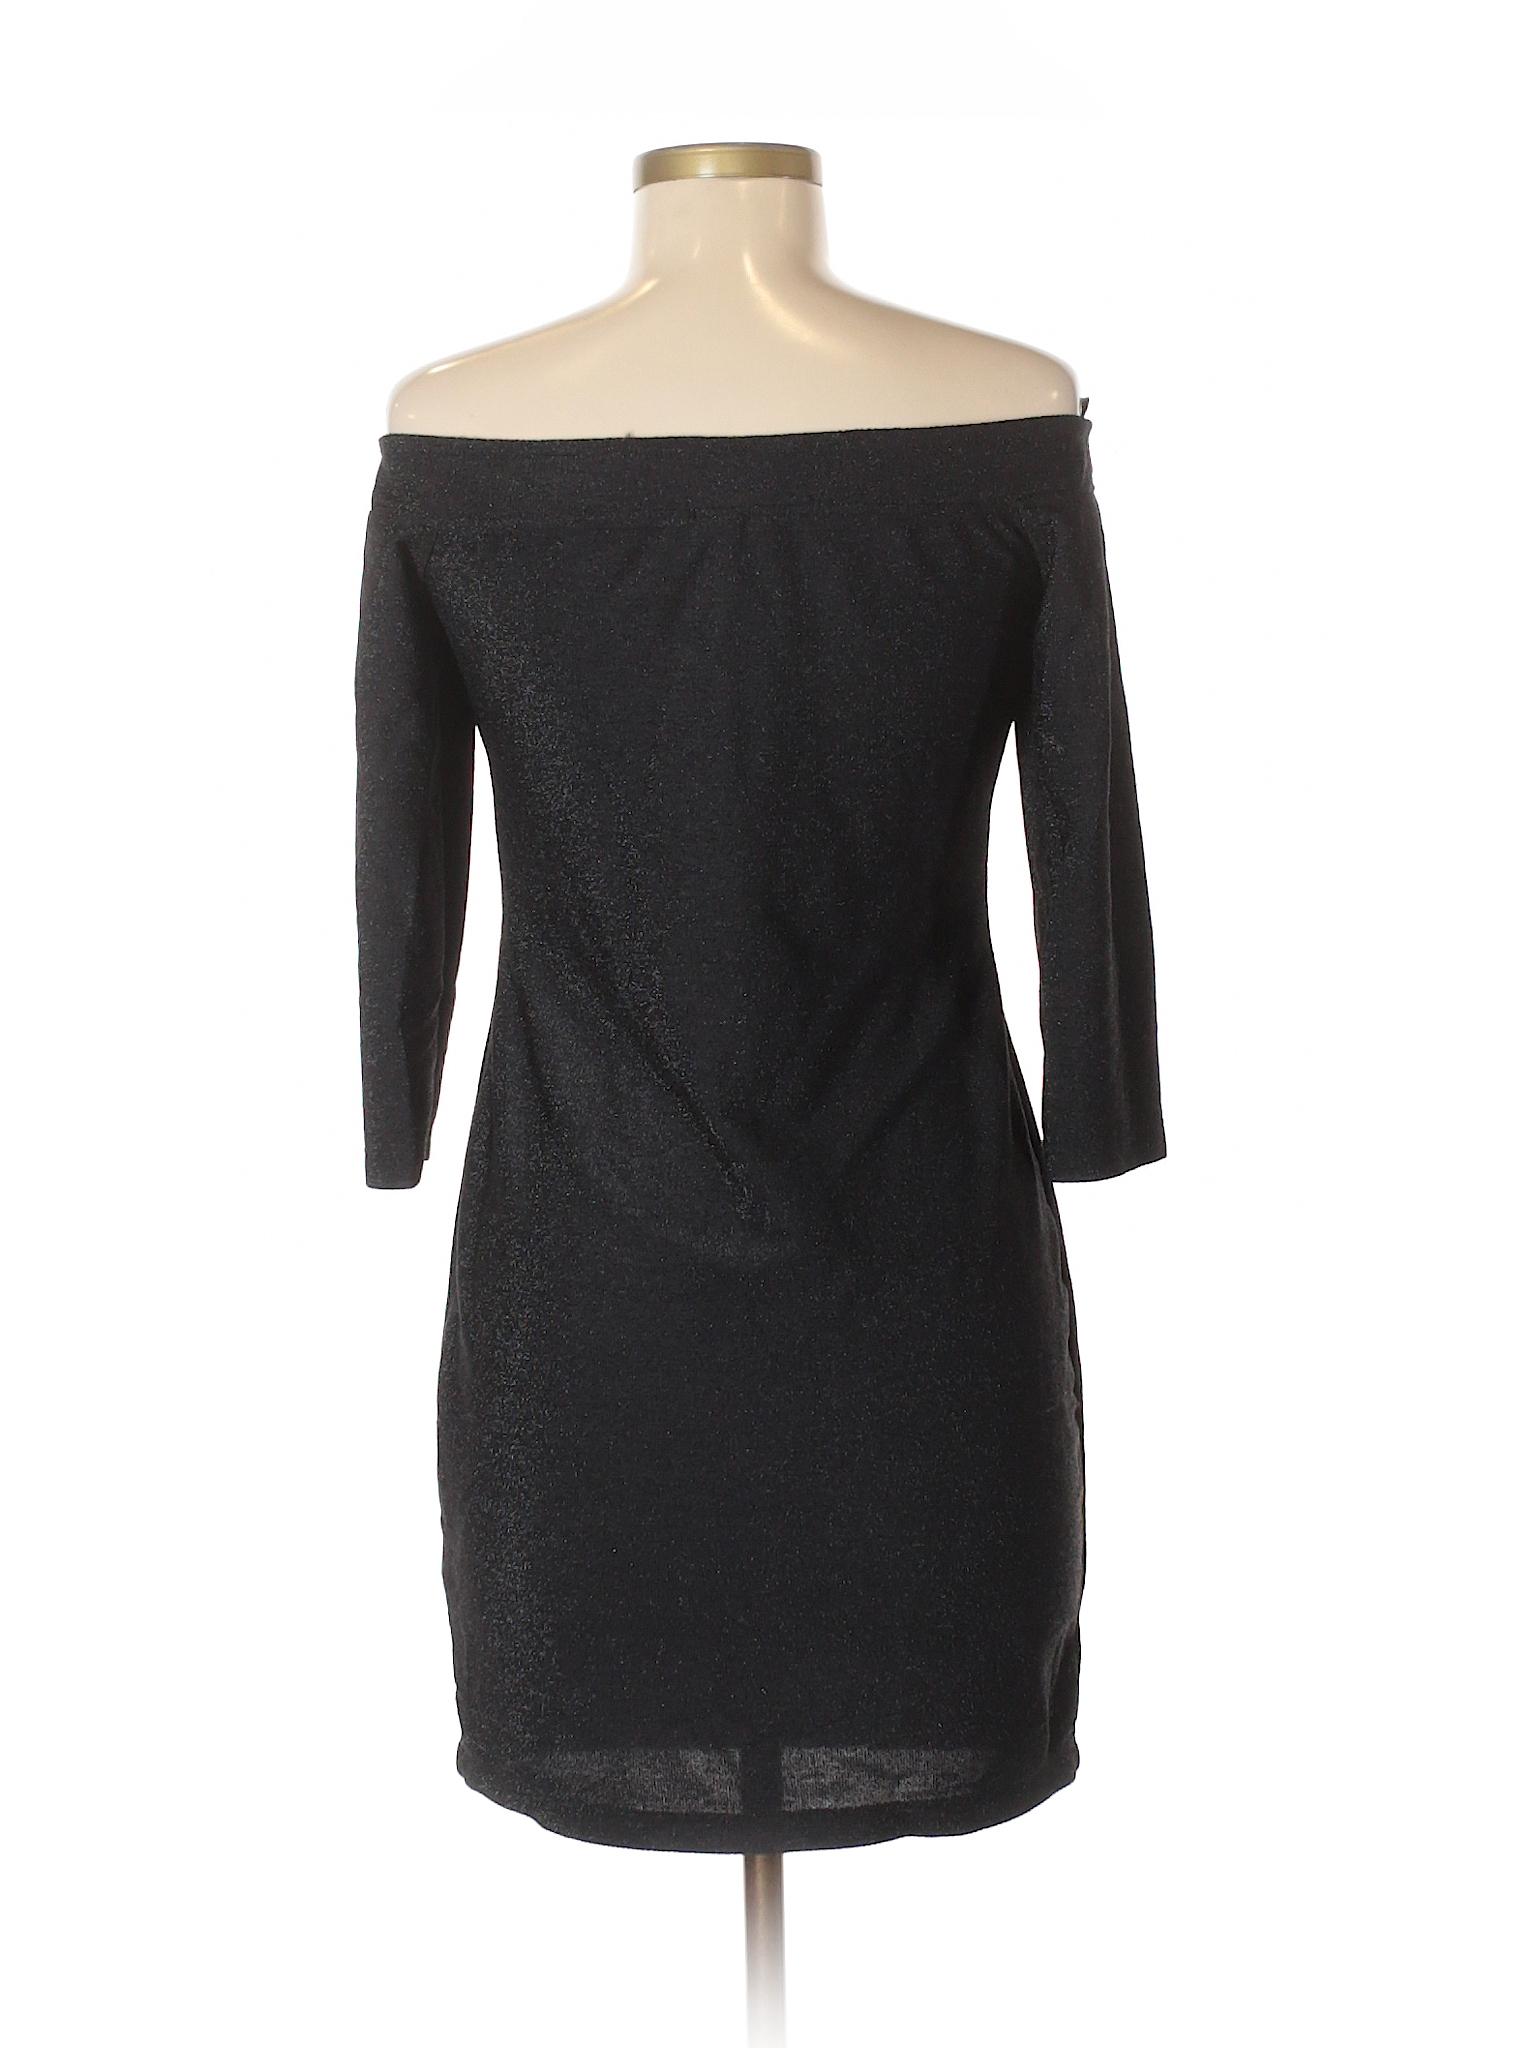 H winter Boutique Casual amp;M Dress 4qgRT